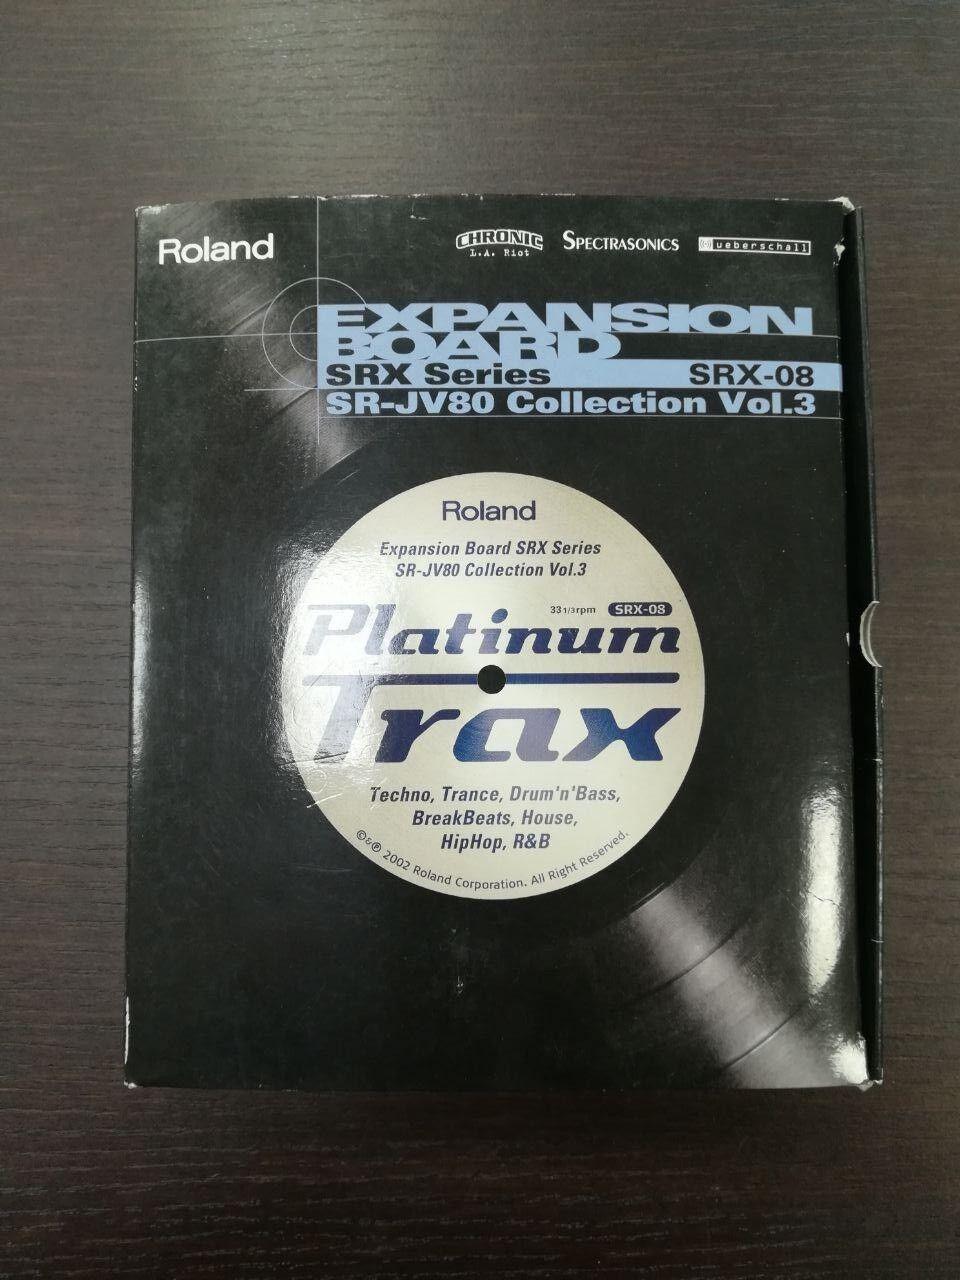 Roland Expansion Board SRX Series